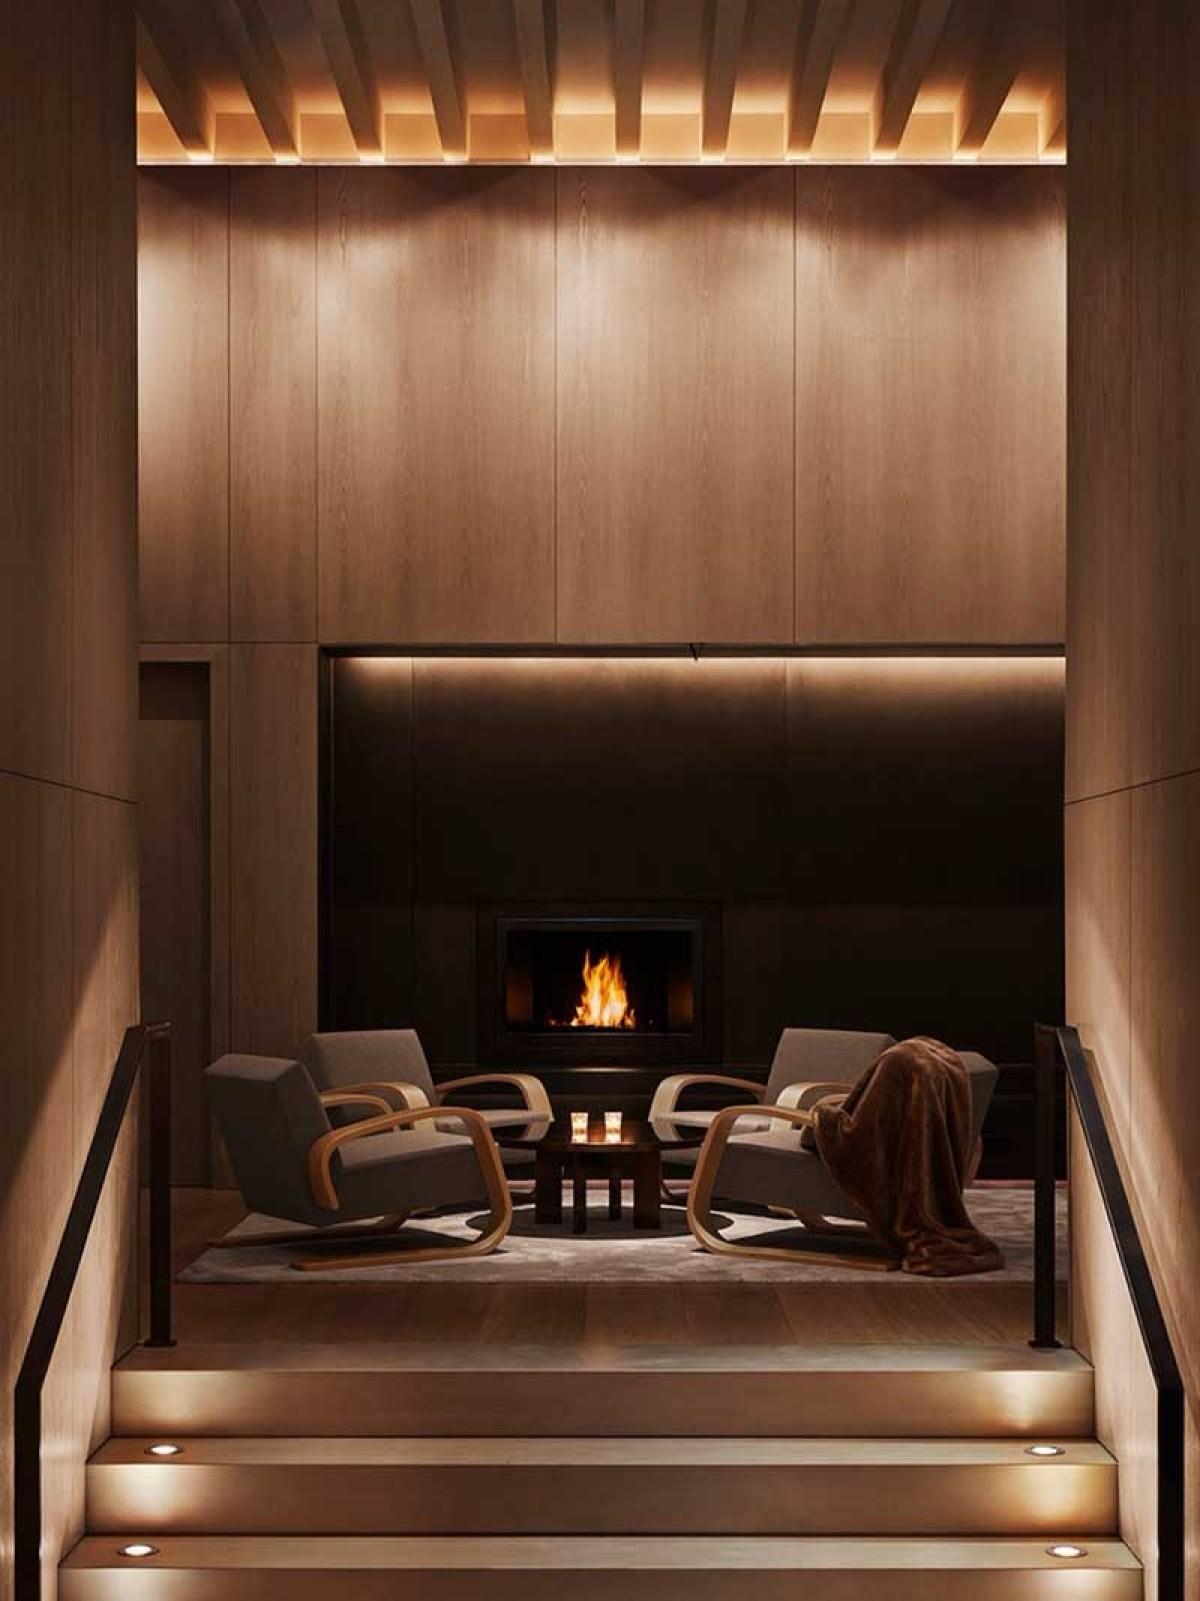 Brilliant-Home-Decor-Ideas-by-2018's-AD100-Best-Interior-Designers